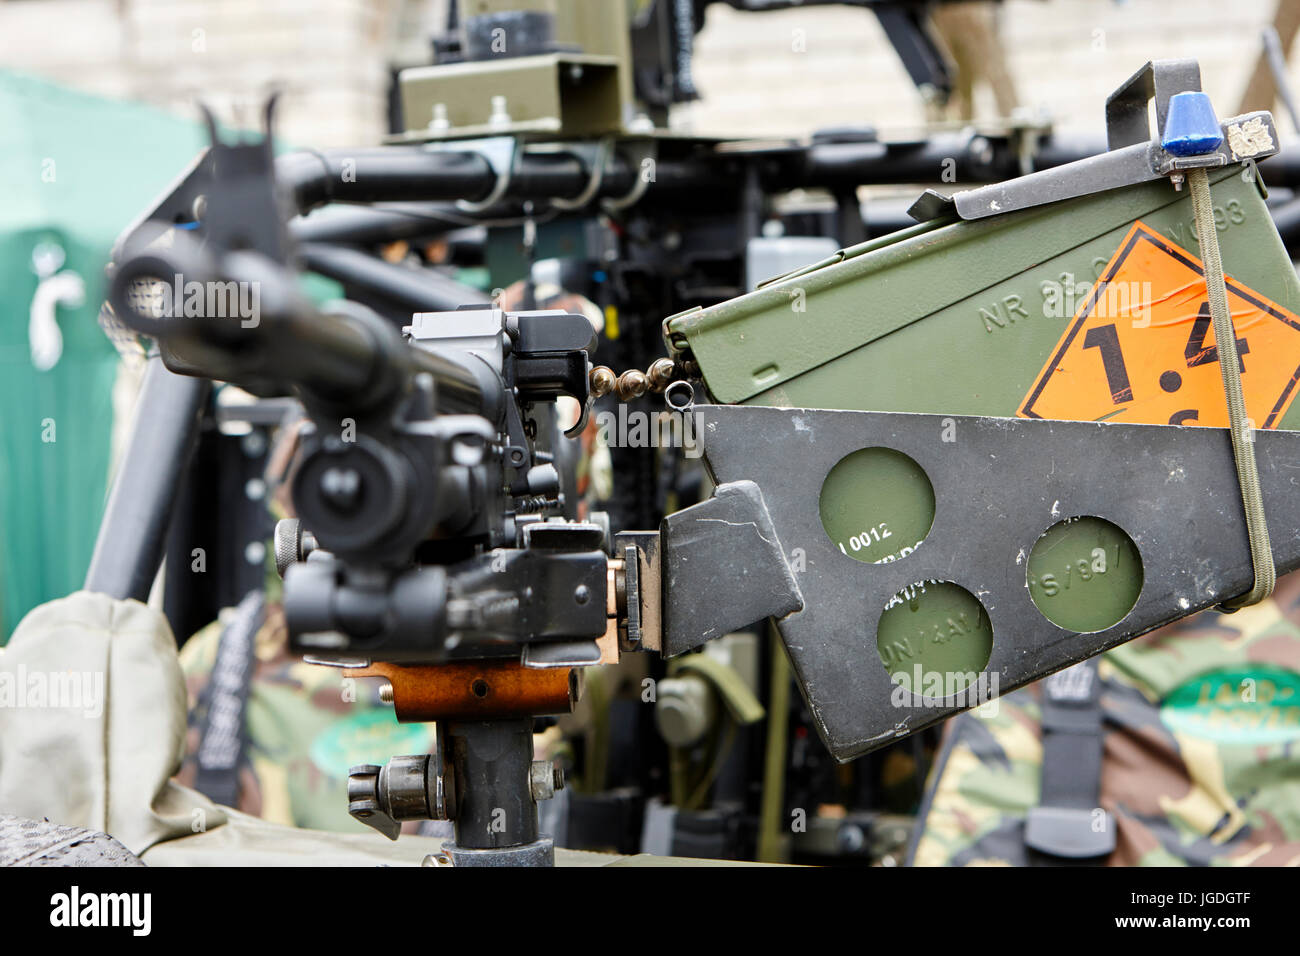 general purpose machine gun weapon mounted on a british army vehicle uk - Stock Image